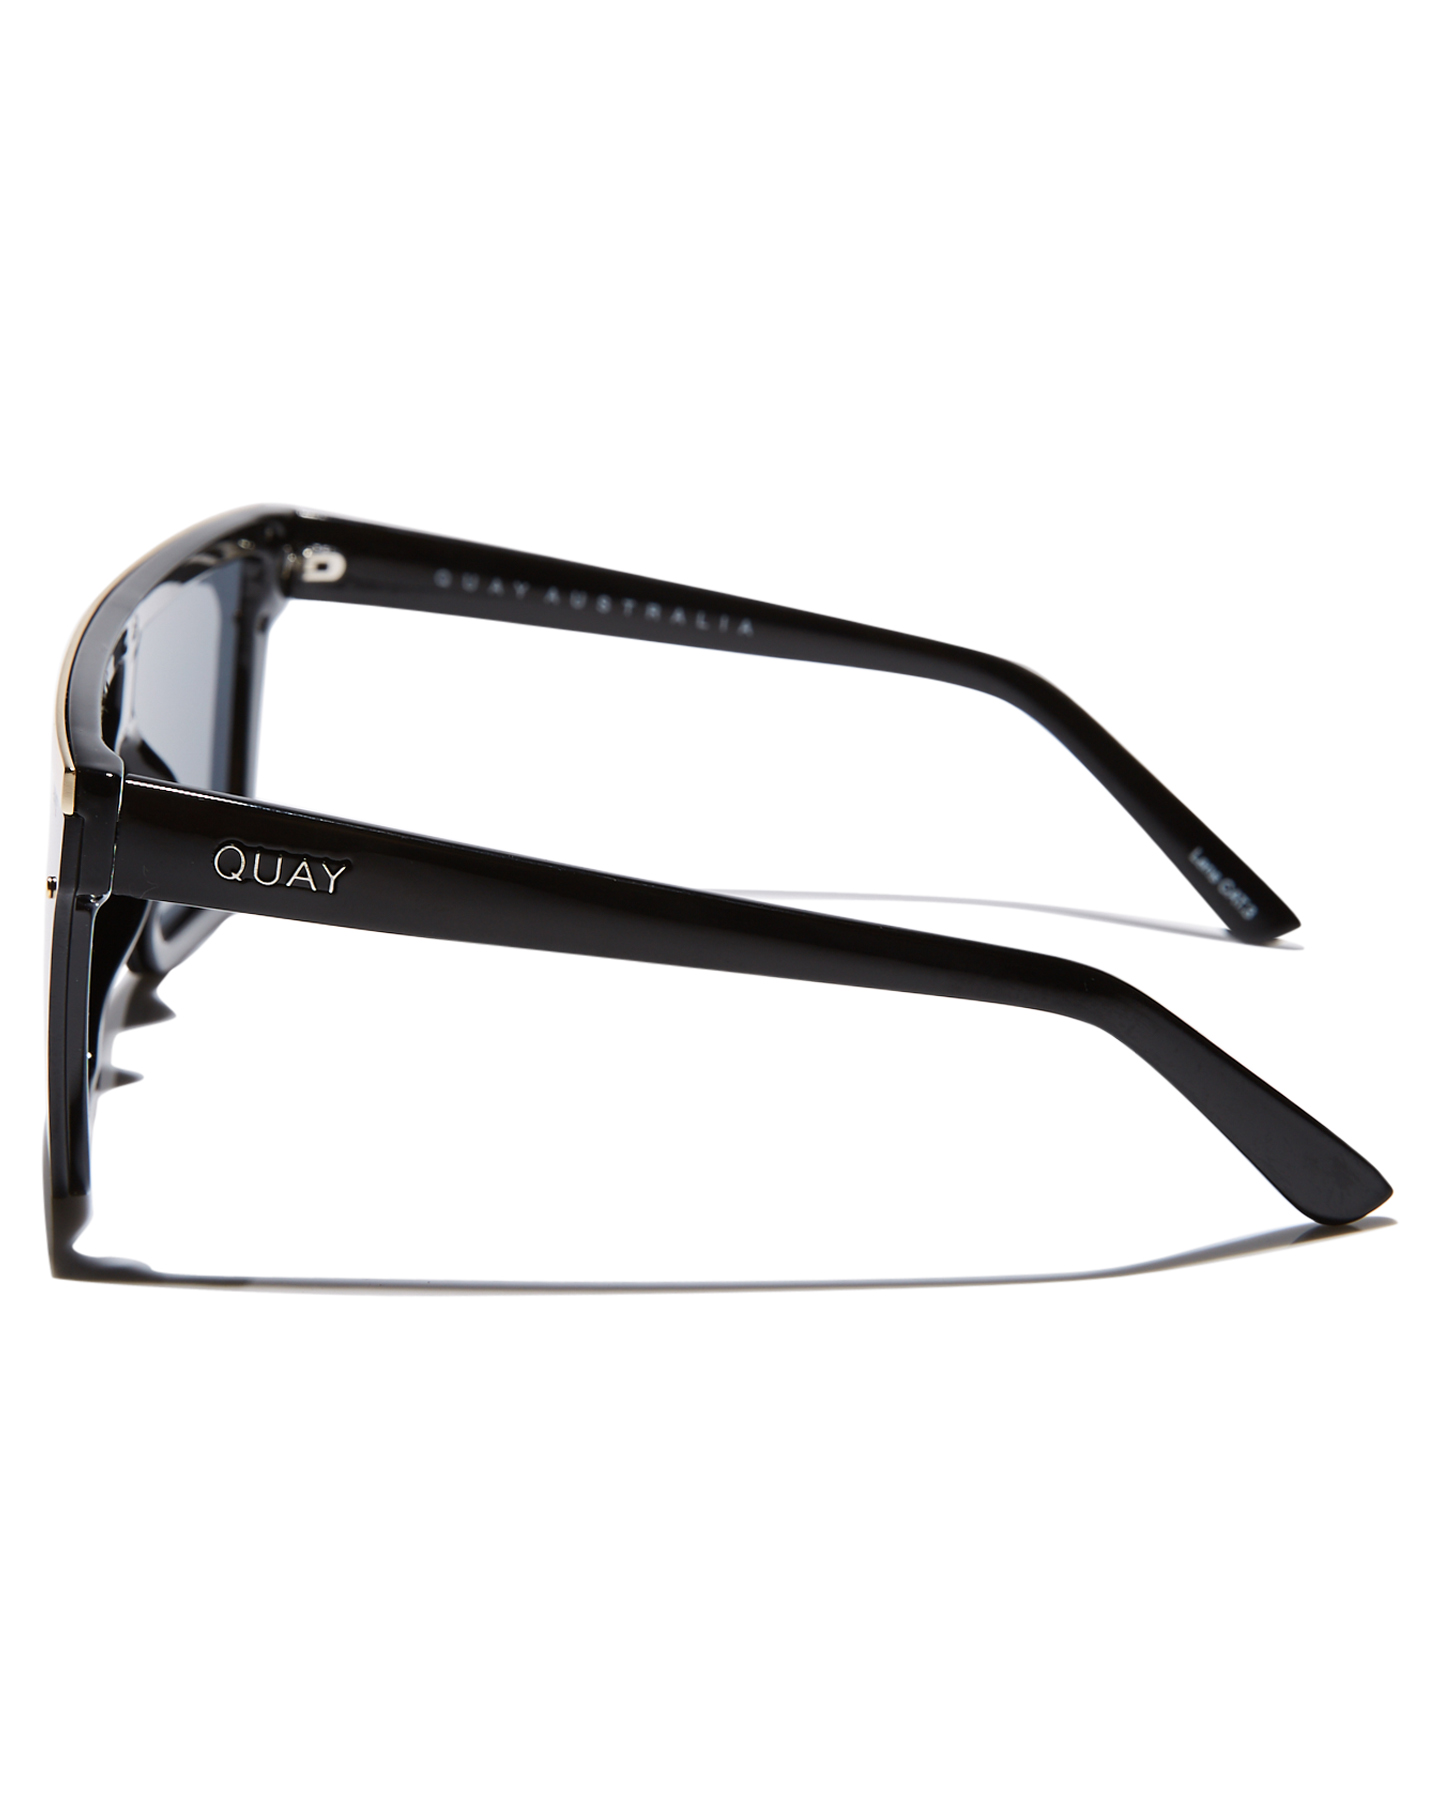 New-Quay-Eyewear-Women-039-s-Hindsight-Sunglasses-Stainless-Steel-Glass-Pink thumbnail 8